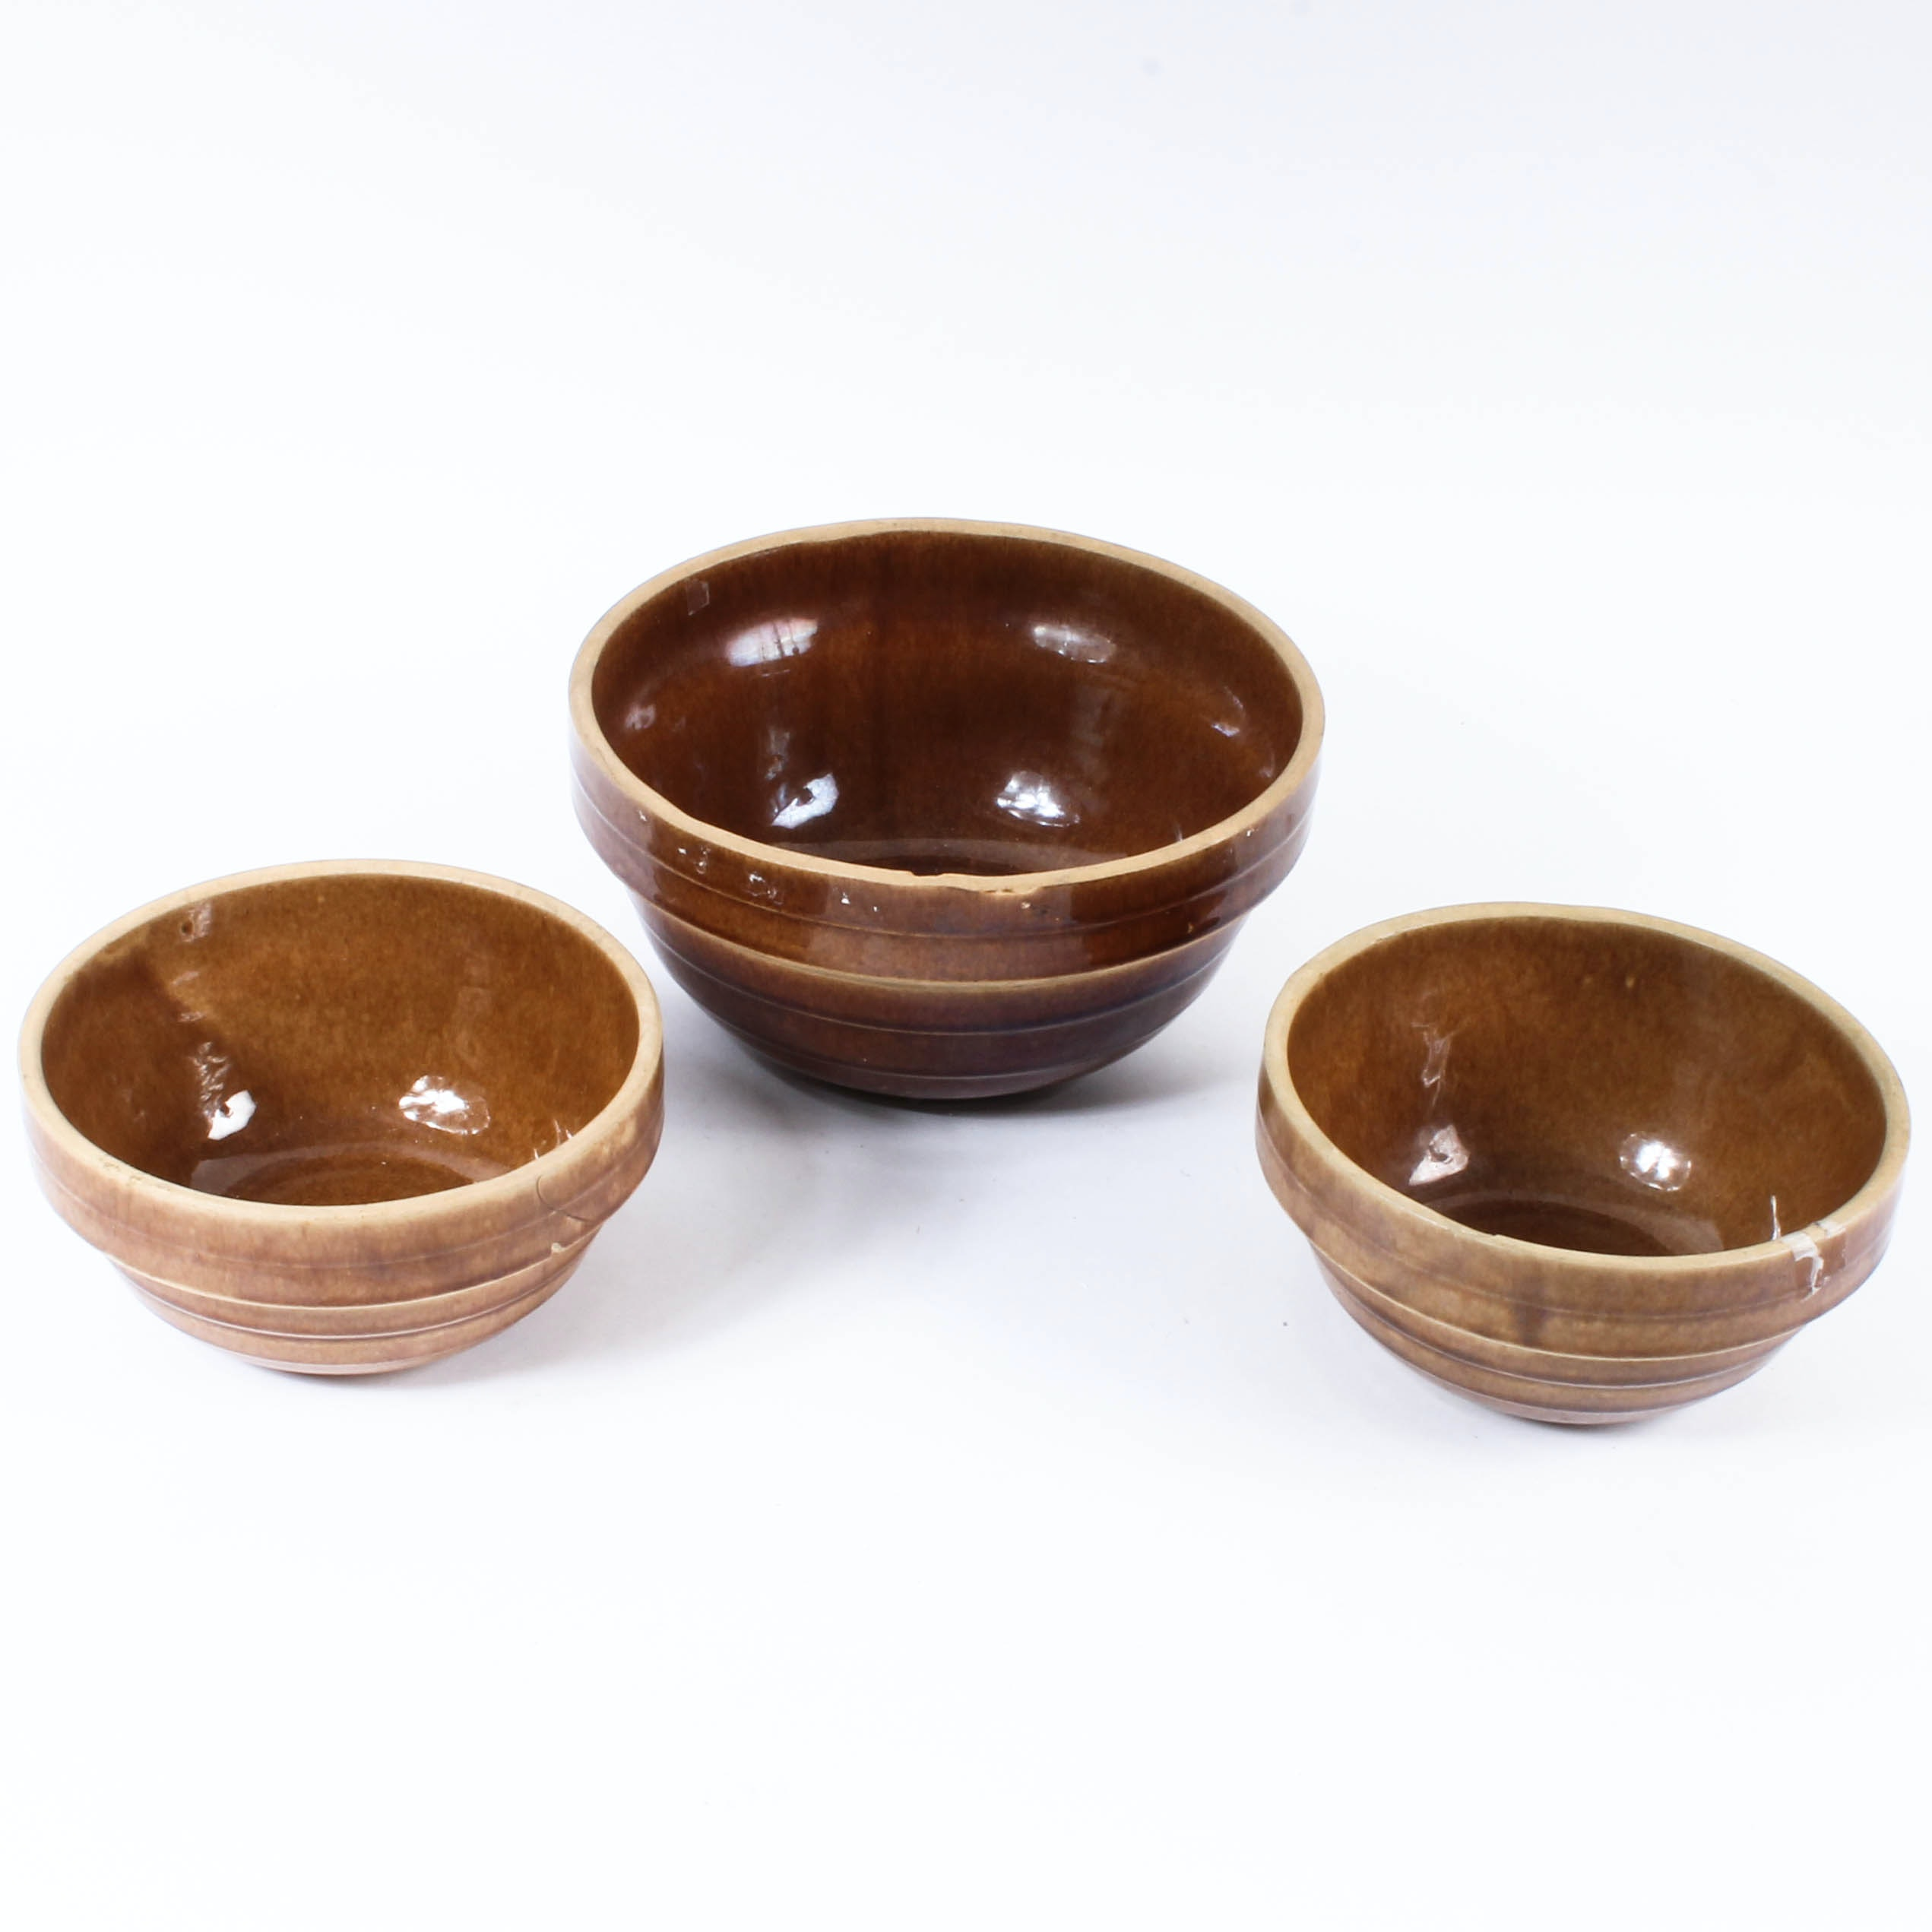 Mottled Brown Glazed Ceramic Mixing Bowls